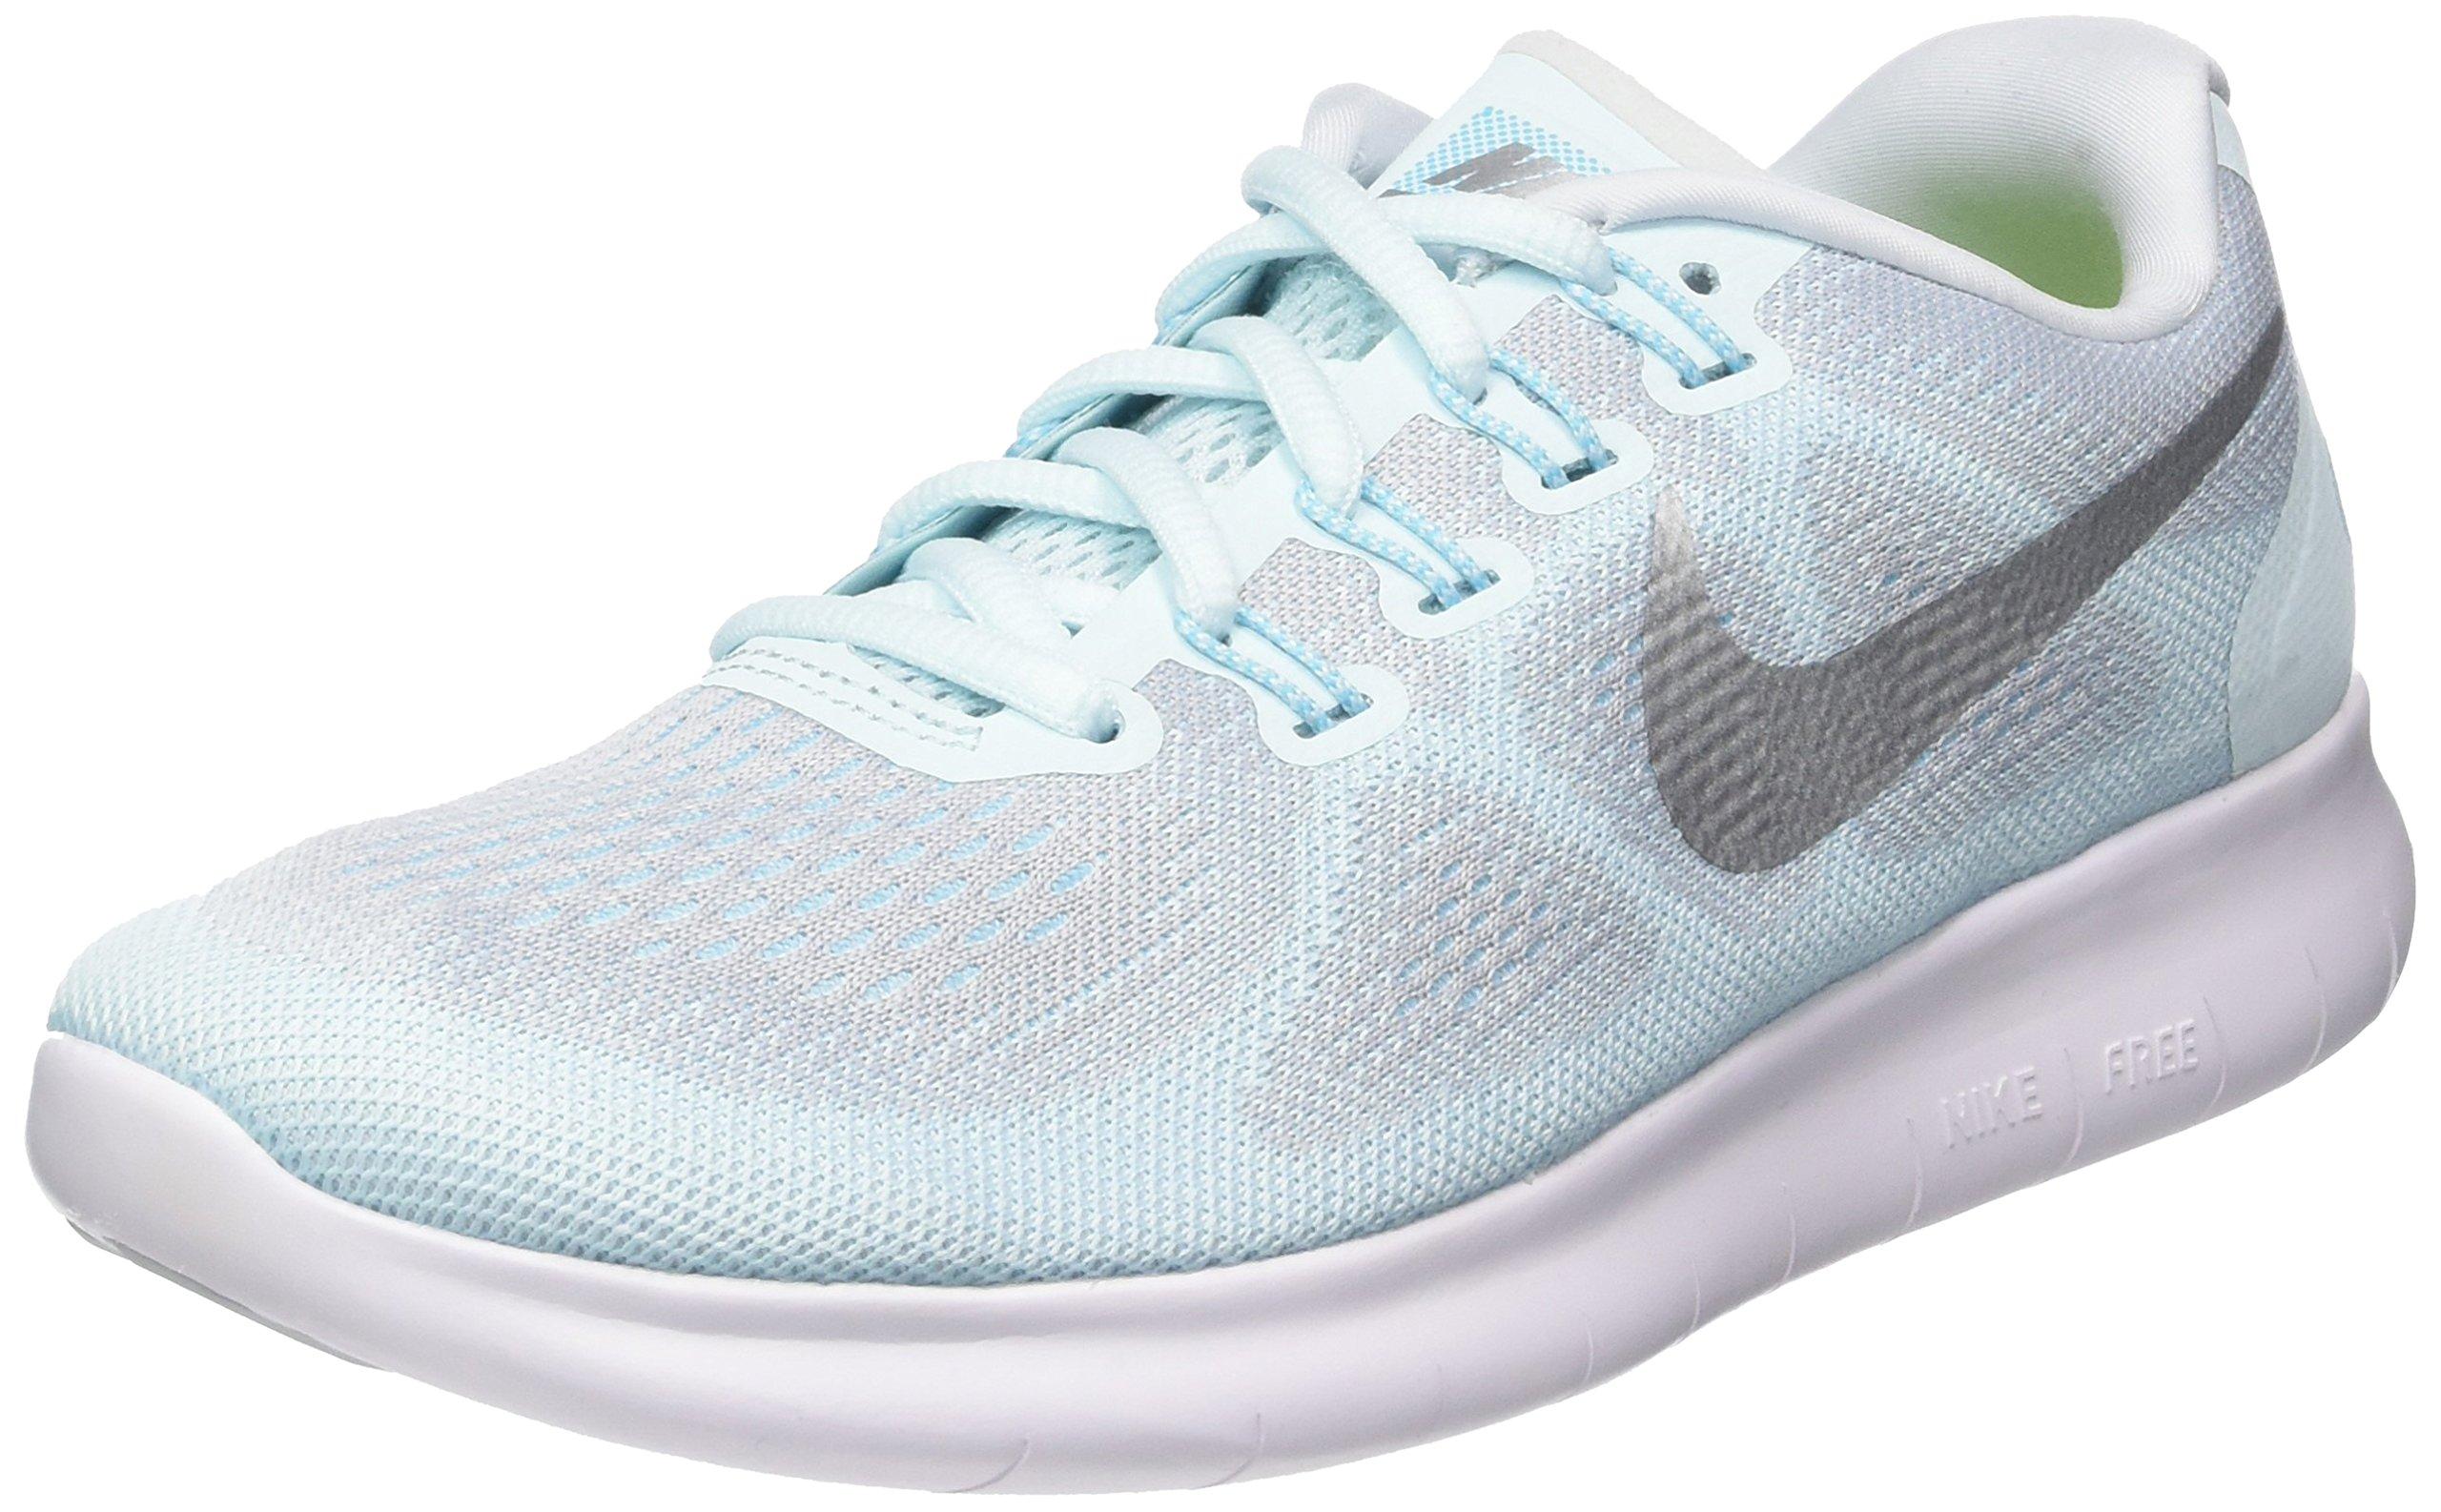 NIKE Womens Free Run 2017 Glacier Blue/Metallic Silver Running Shoes (9.5 B US)